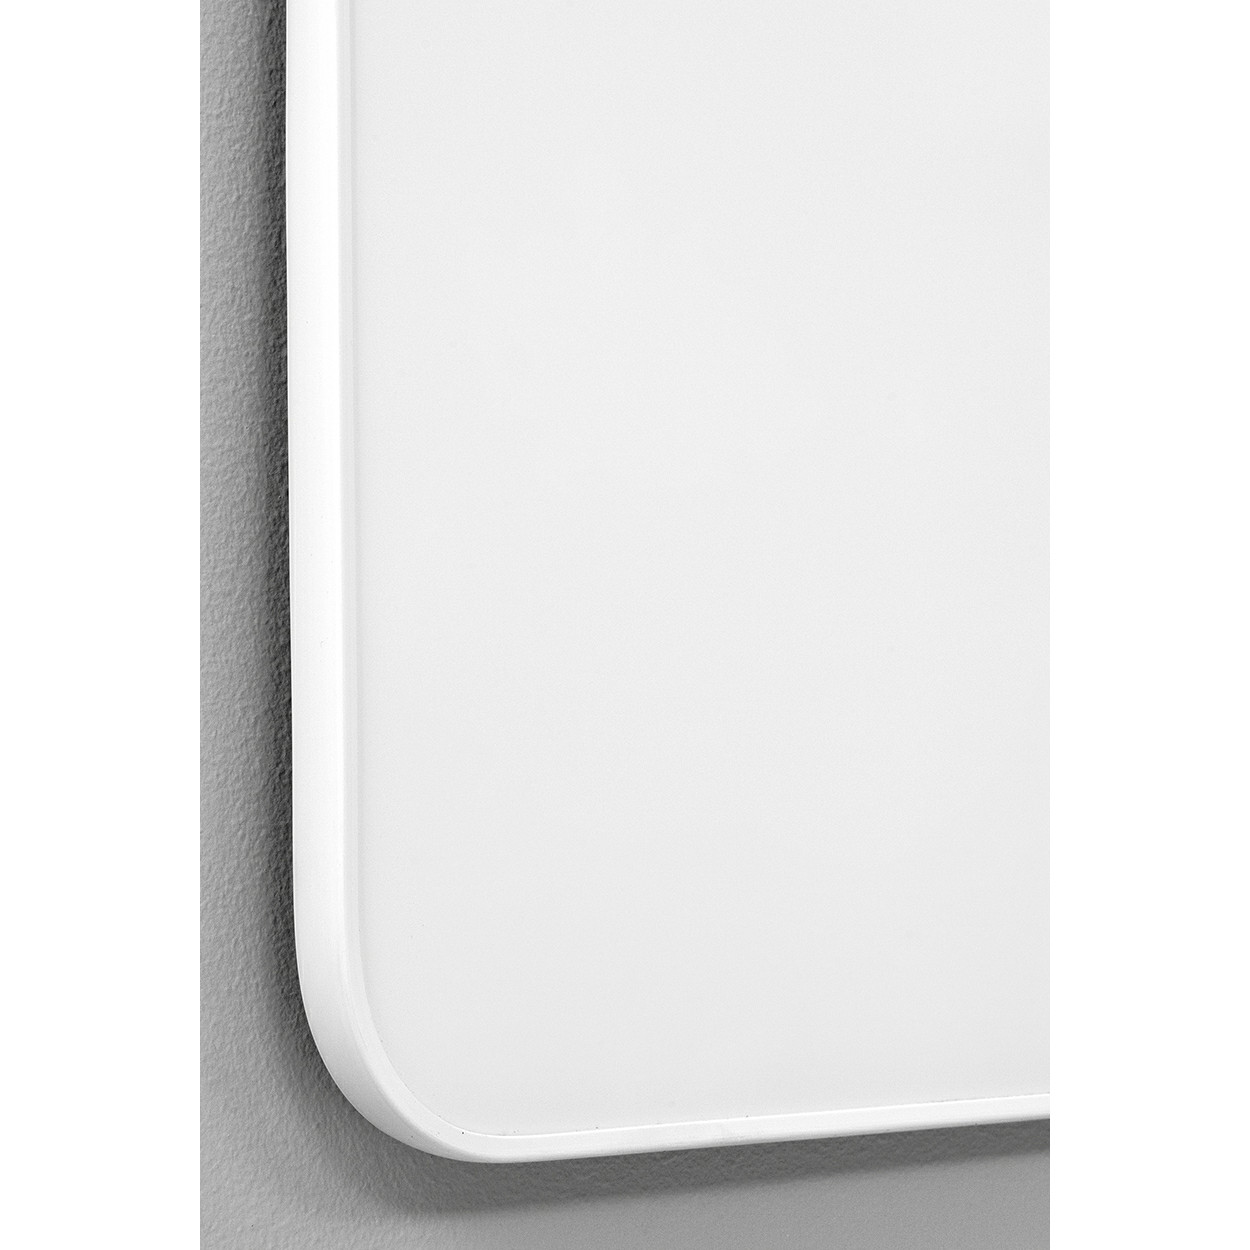 Whiteboard Lintex Edge - med hvid ramme 100 x 120 cm